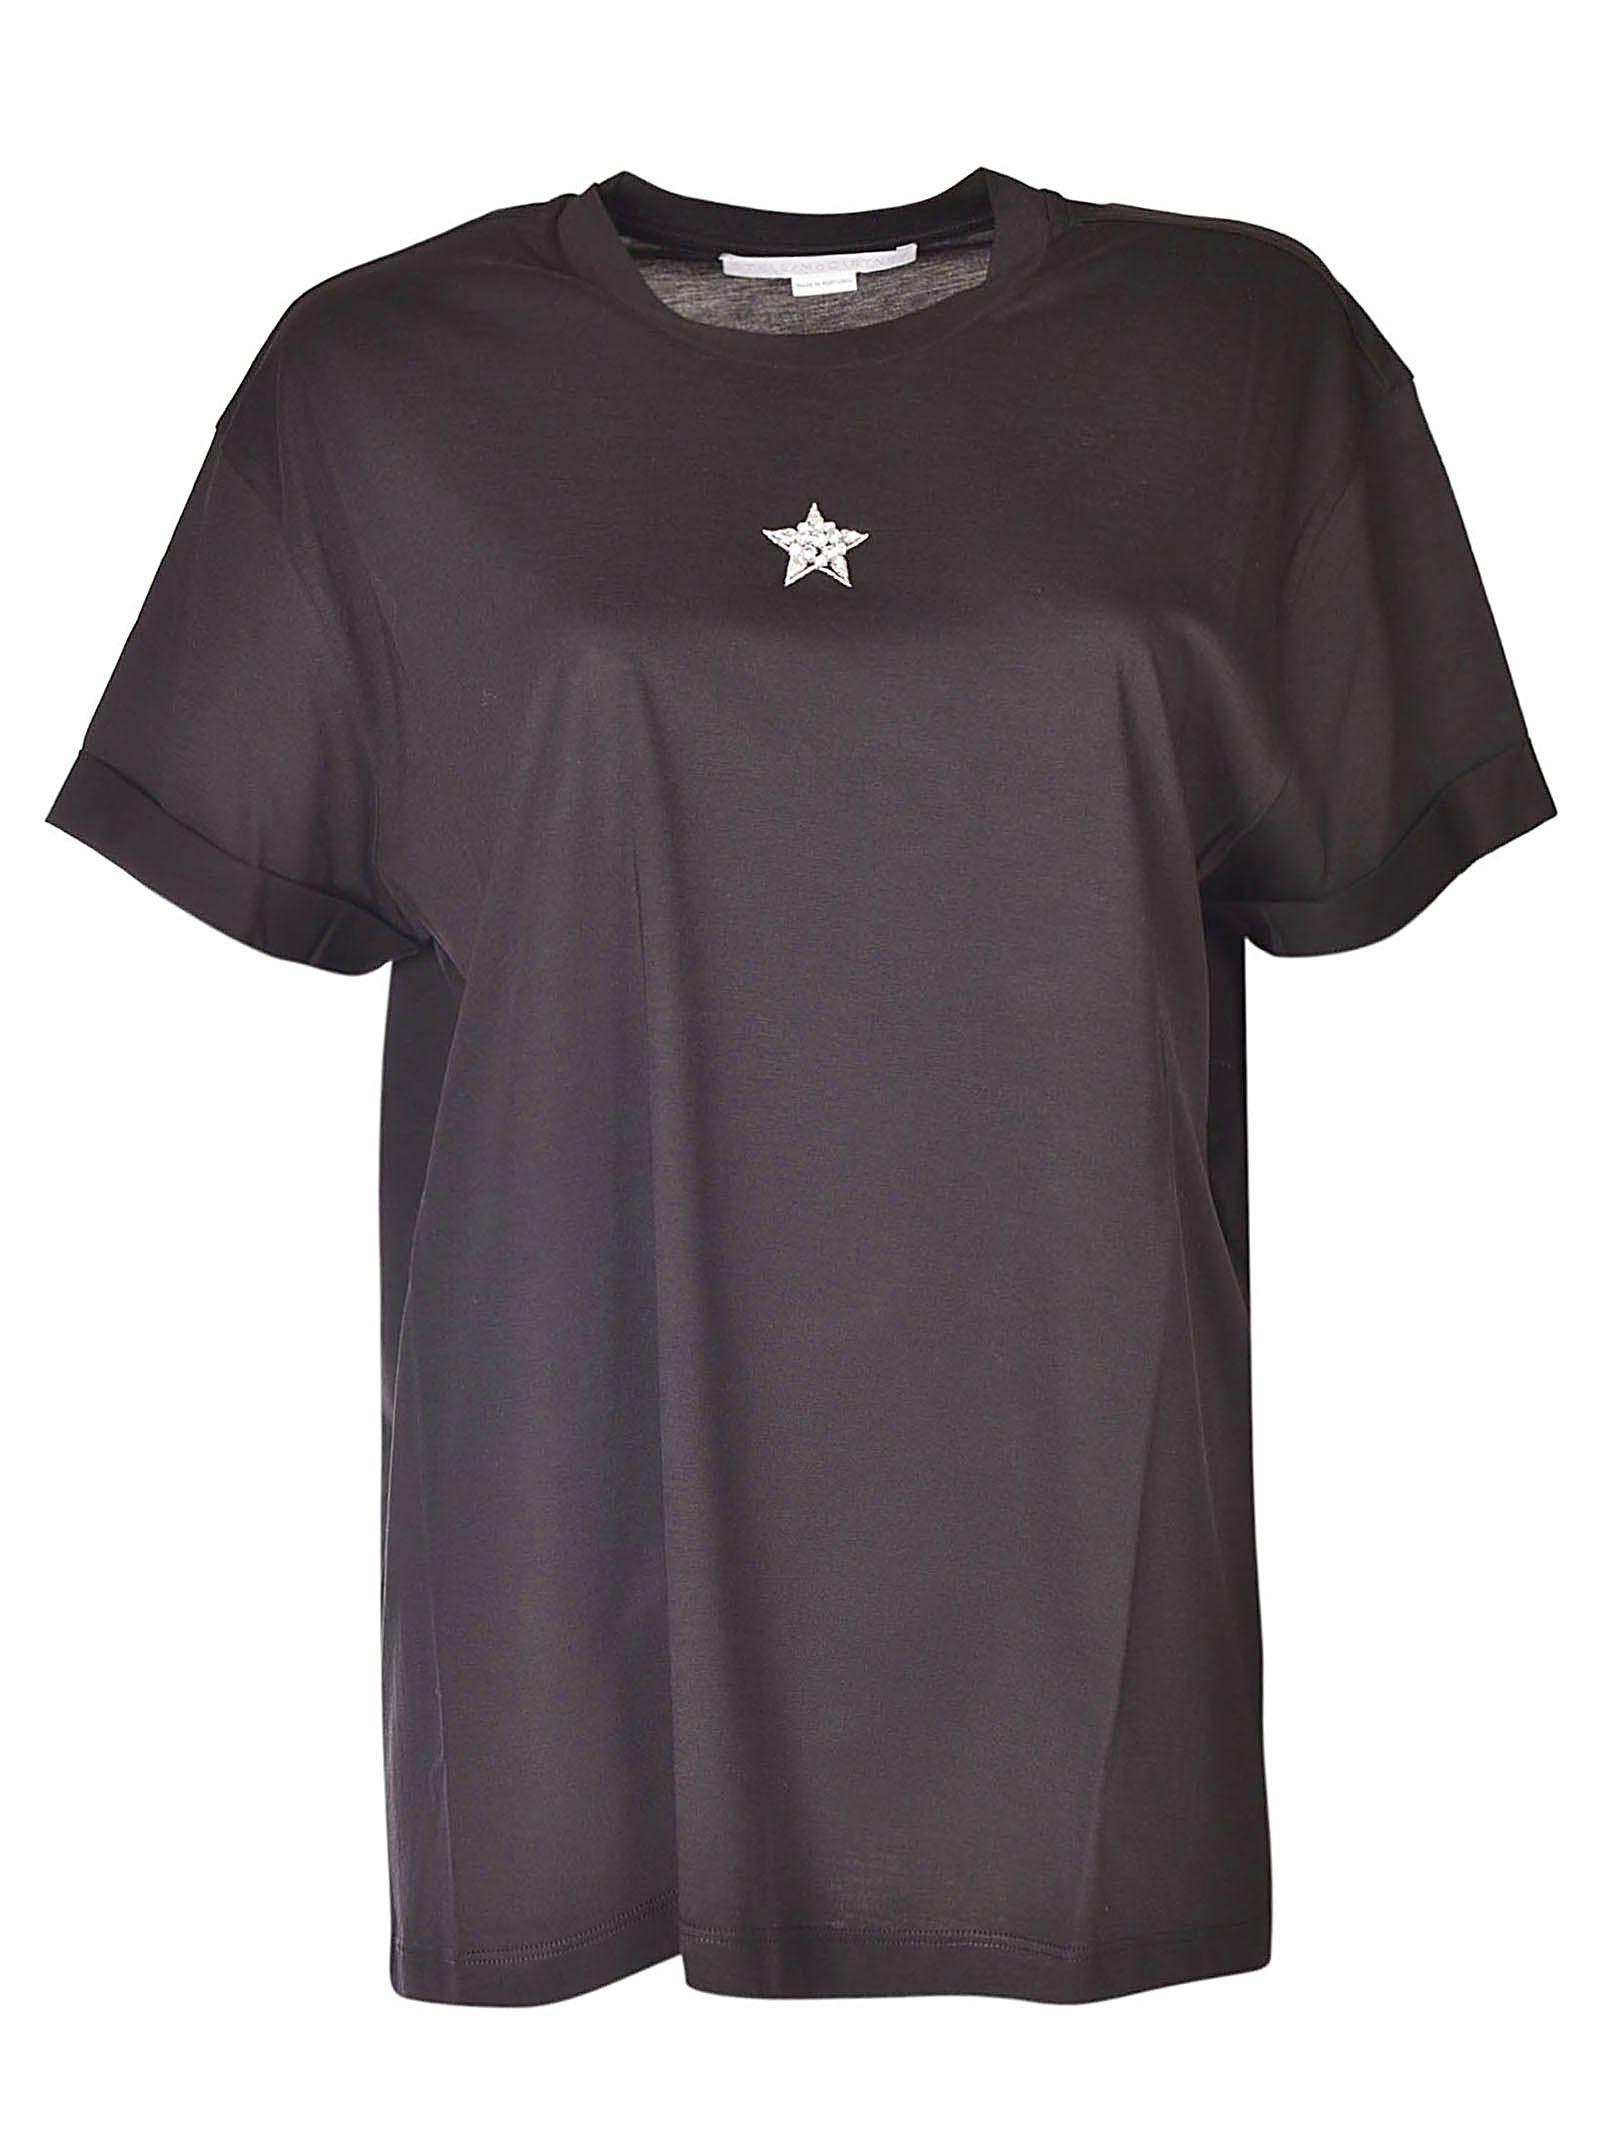 b9dbc6c3423f2 STELLA MCCARTNEY EMBELLISHED STAR T-SHIRT